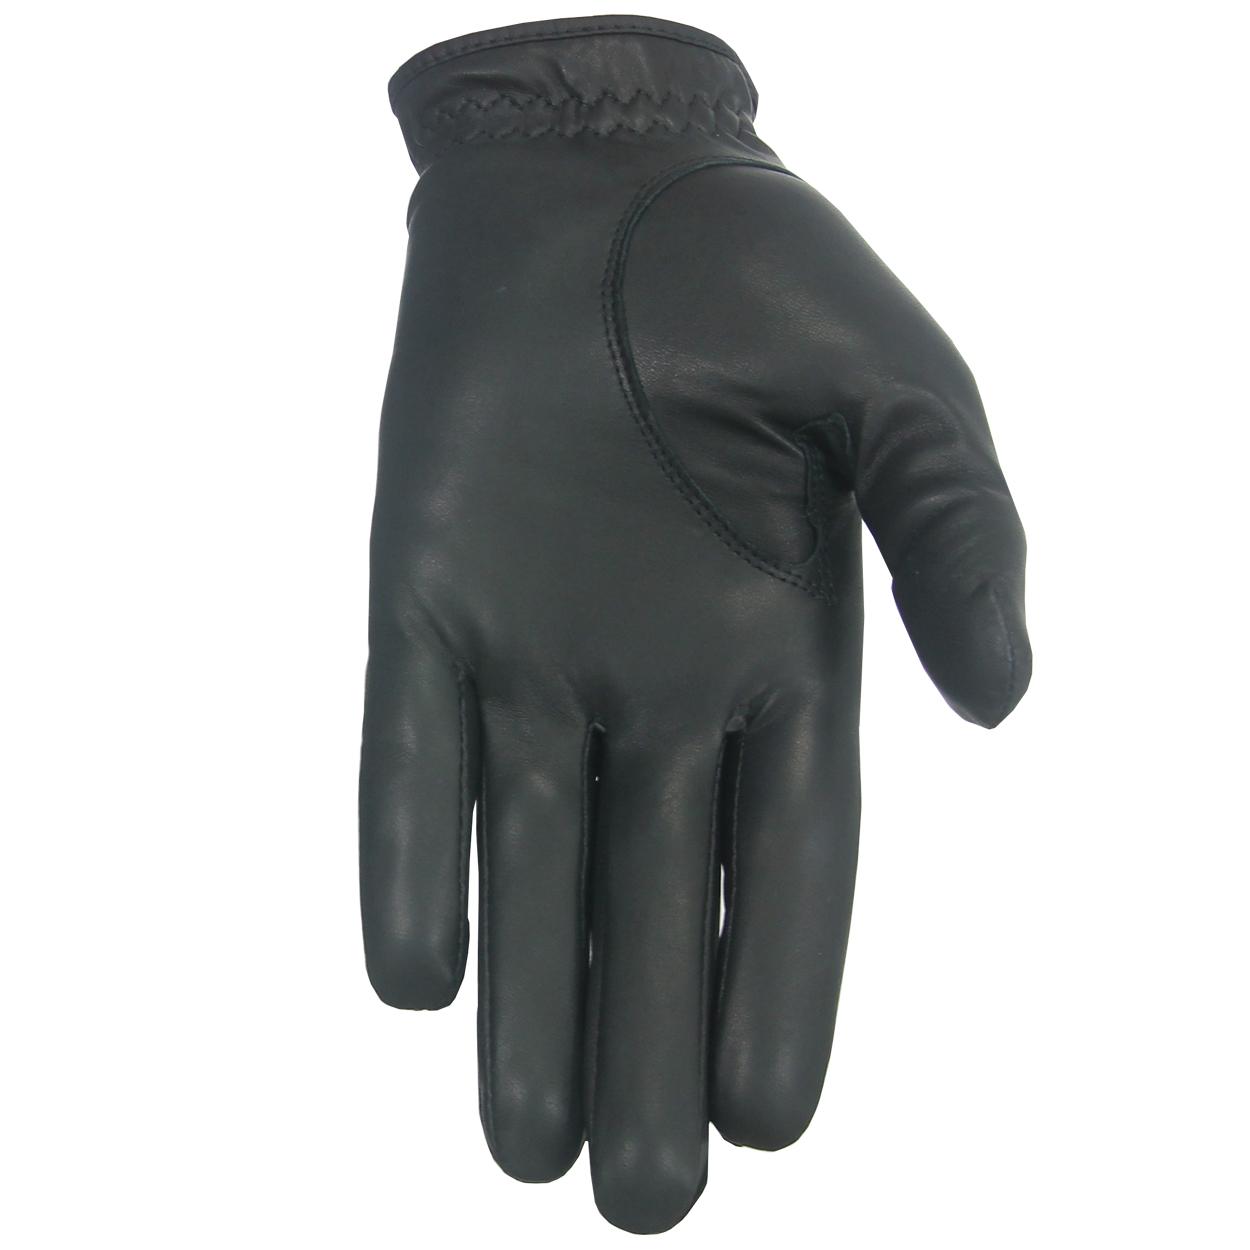 Black leather golf gloves - Puma Pro Performance Tour Leather Golf Gloves 3